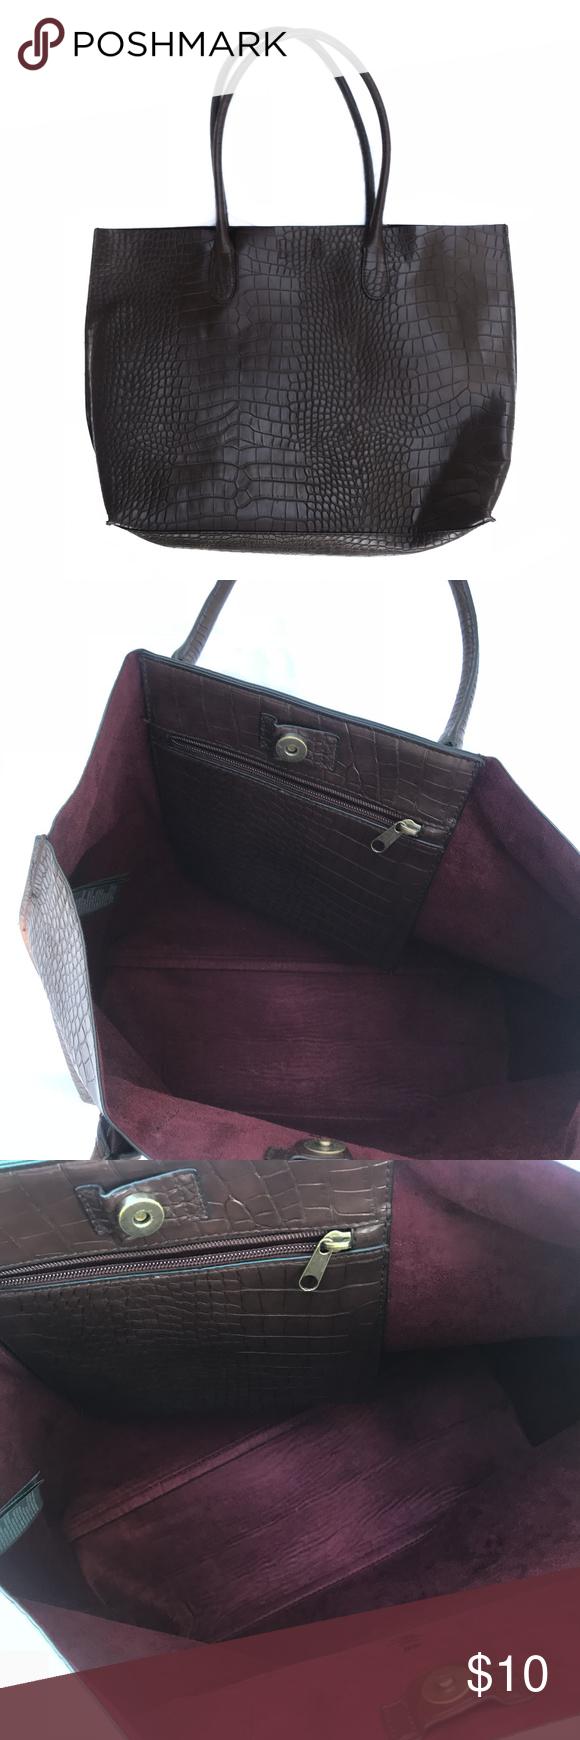 H M Brown Snake Skin Tote Shopper Bag H M Brown Snake Skin Tote Shopper Bag  in faux e213bec724